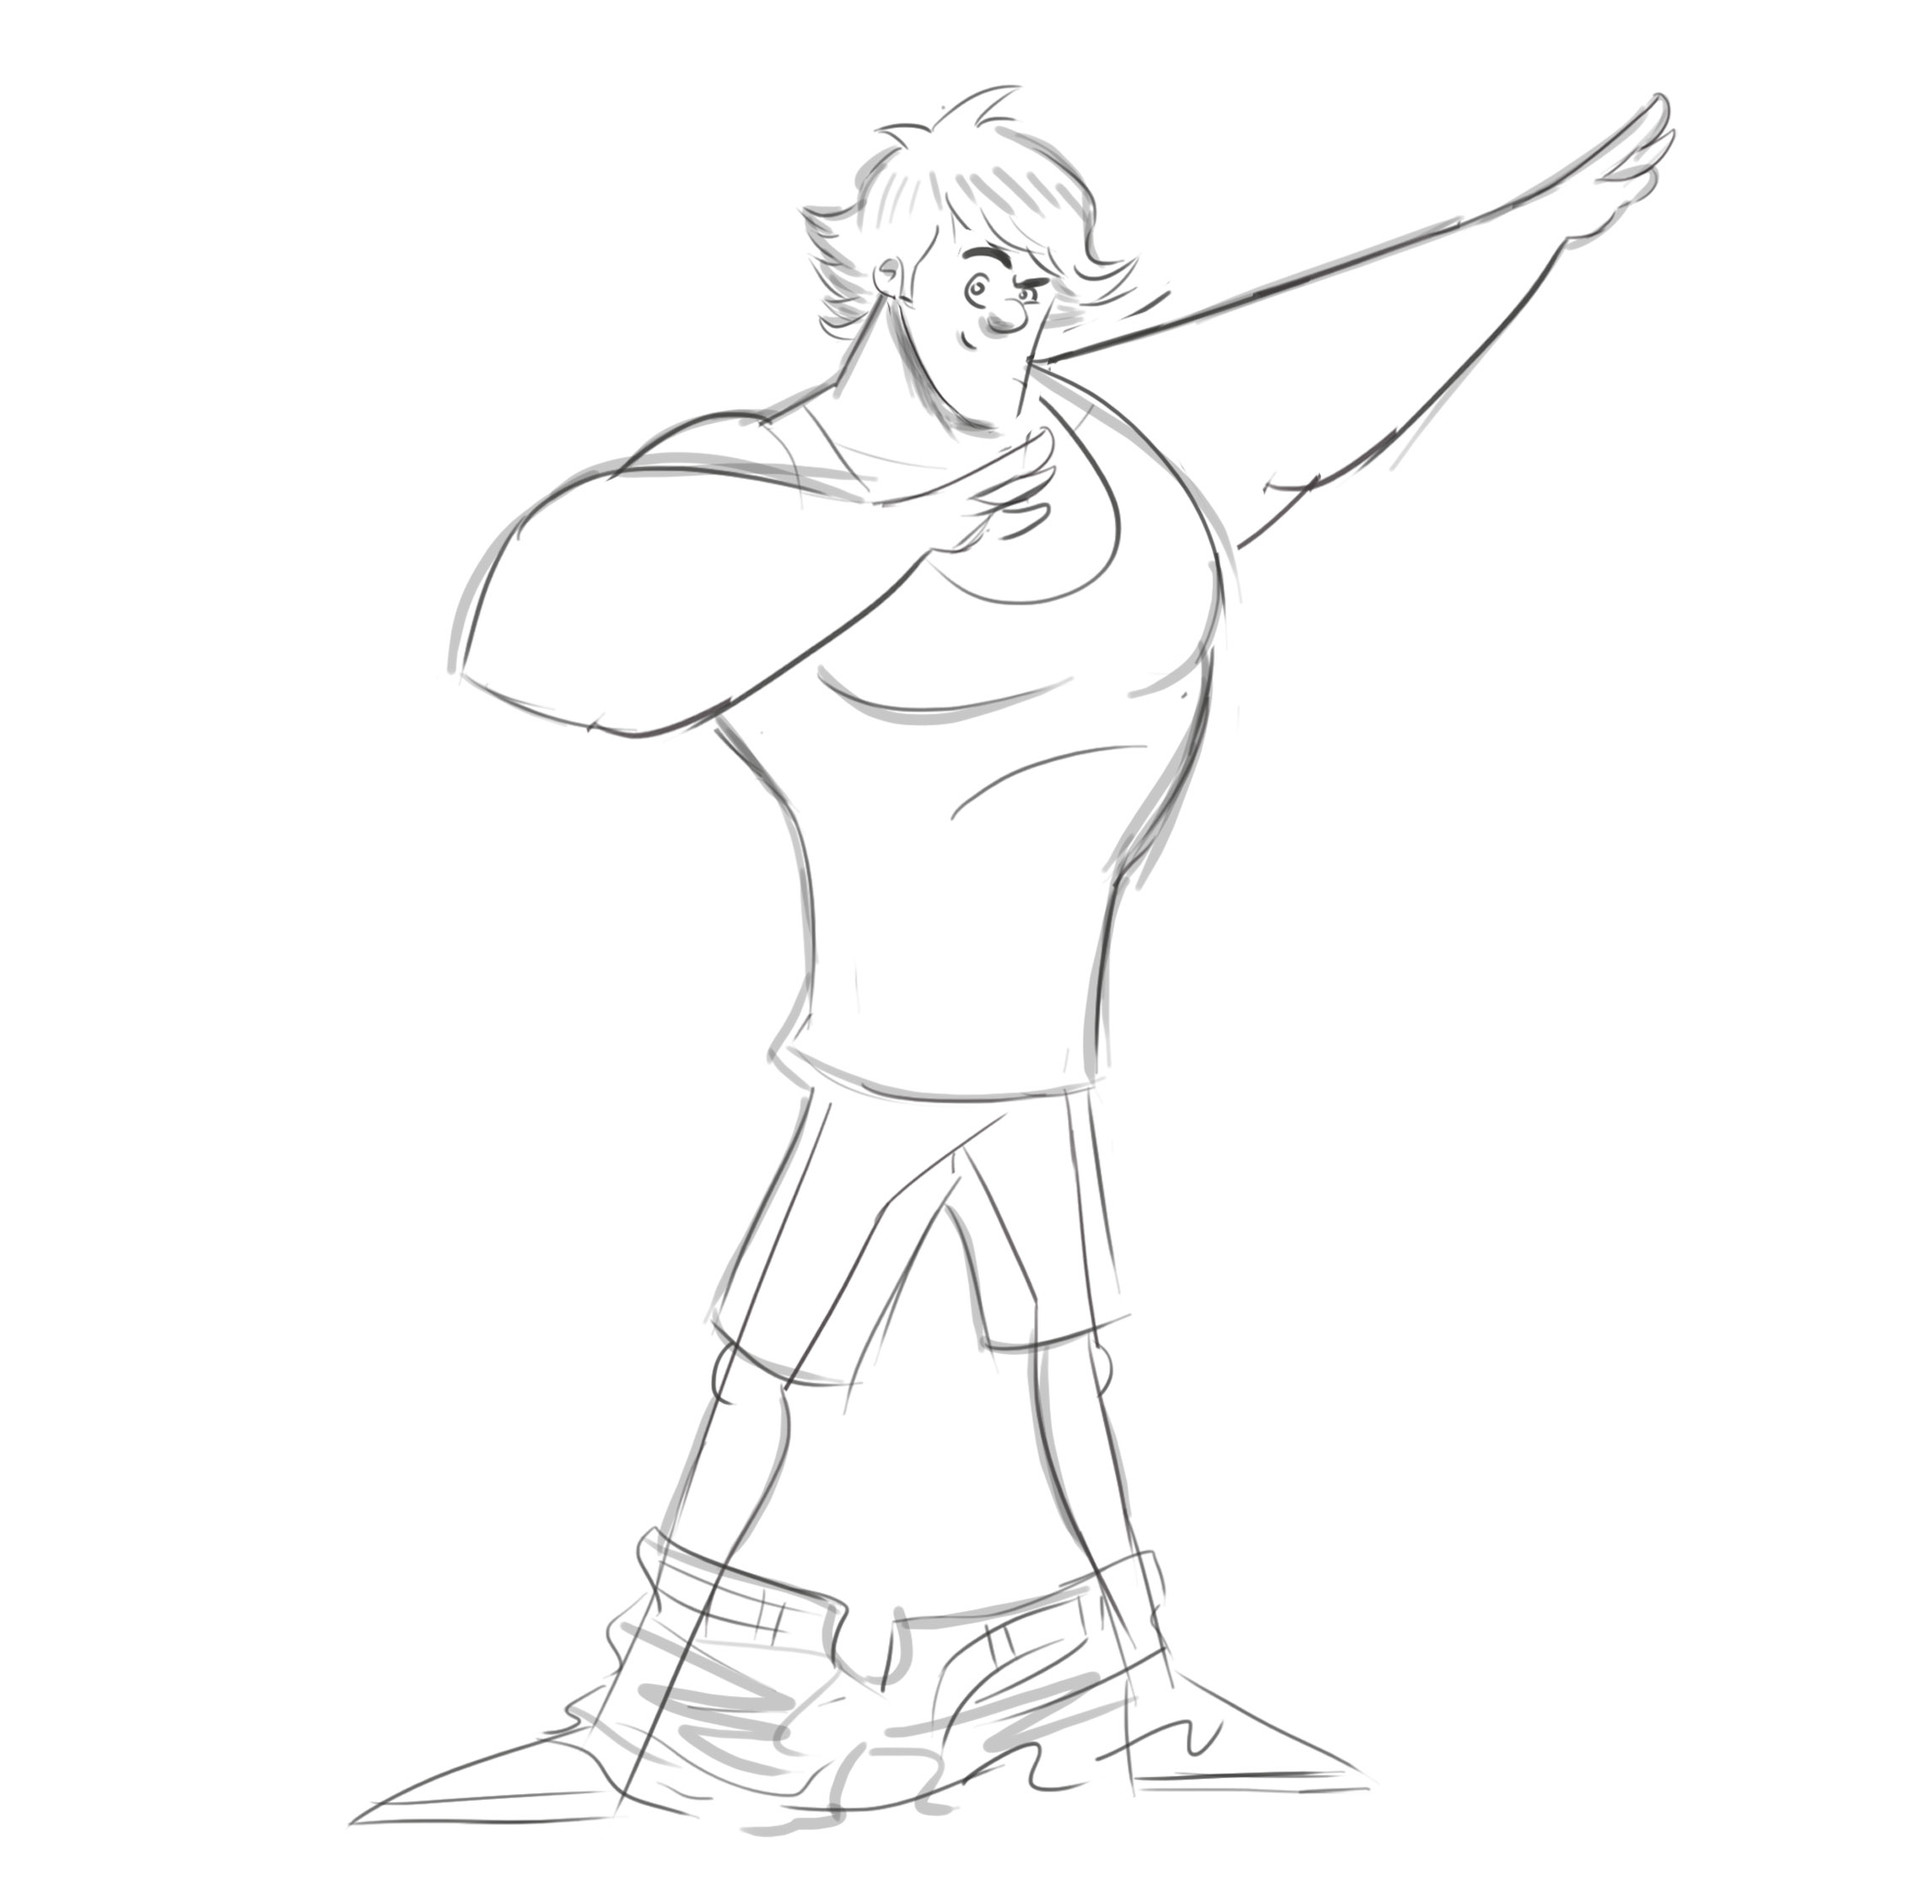 Logan paul base sketch